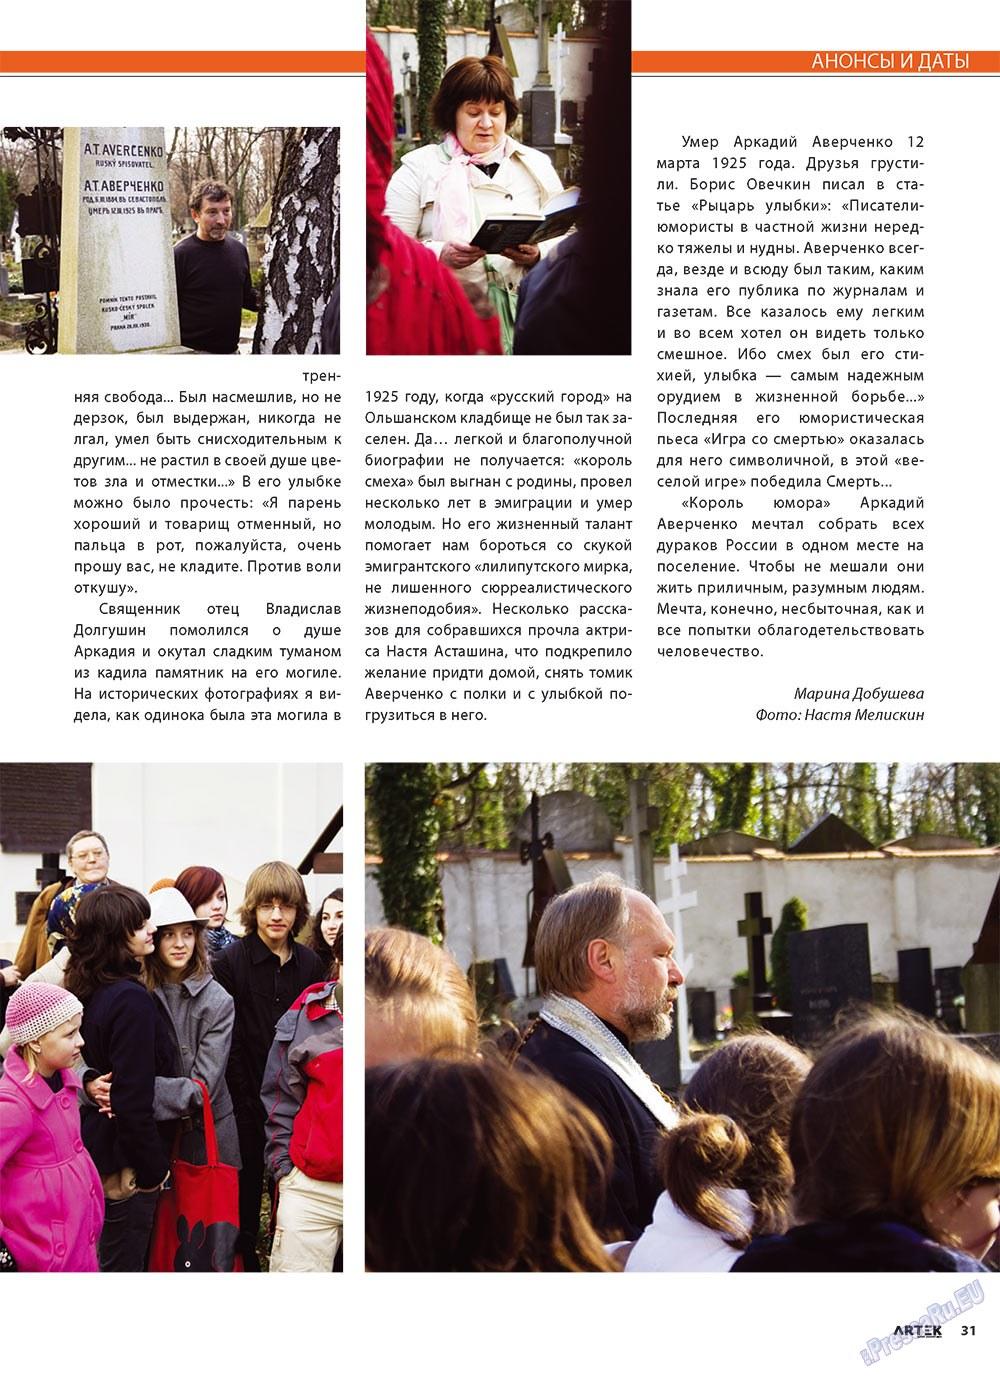 Артек (журнал). 2010 год, номер 2, стр. 33